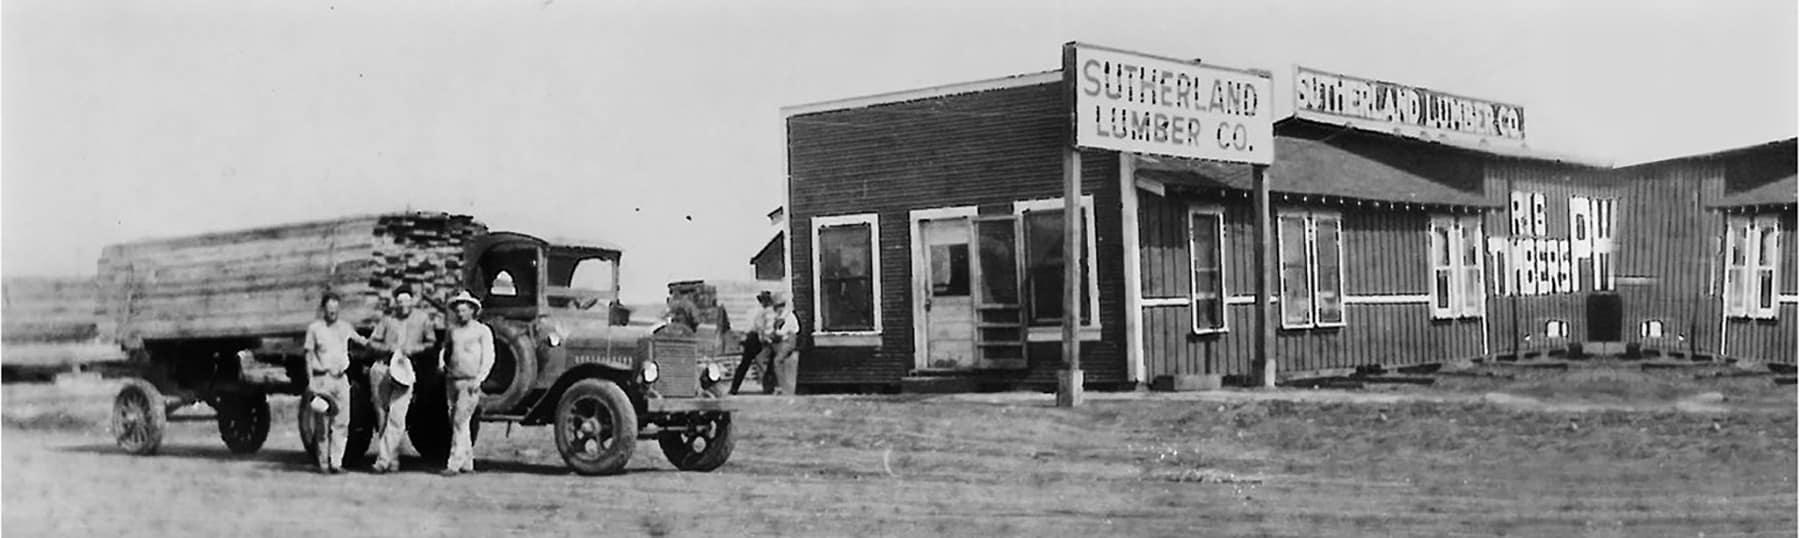 Old Sutherland Lumber